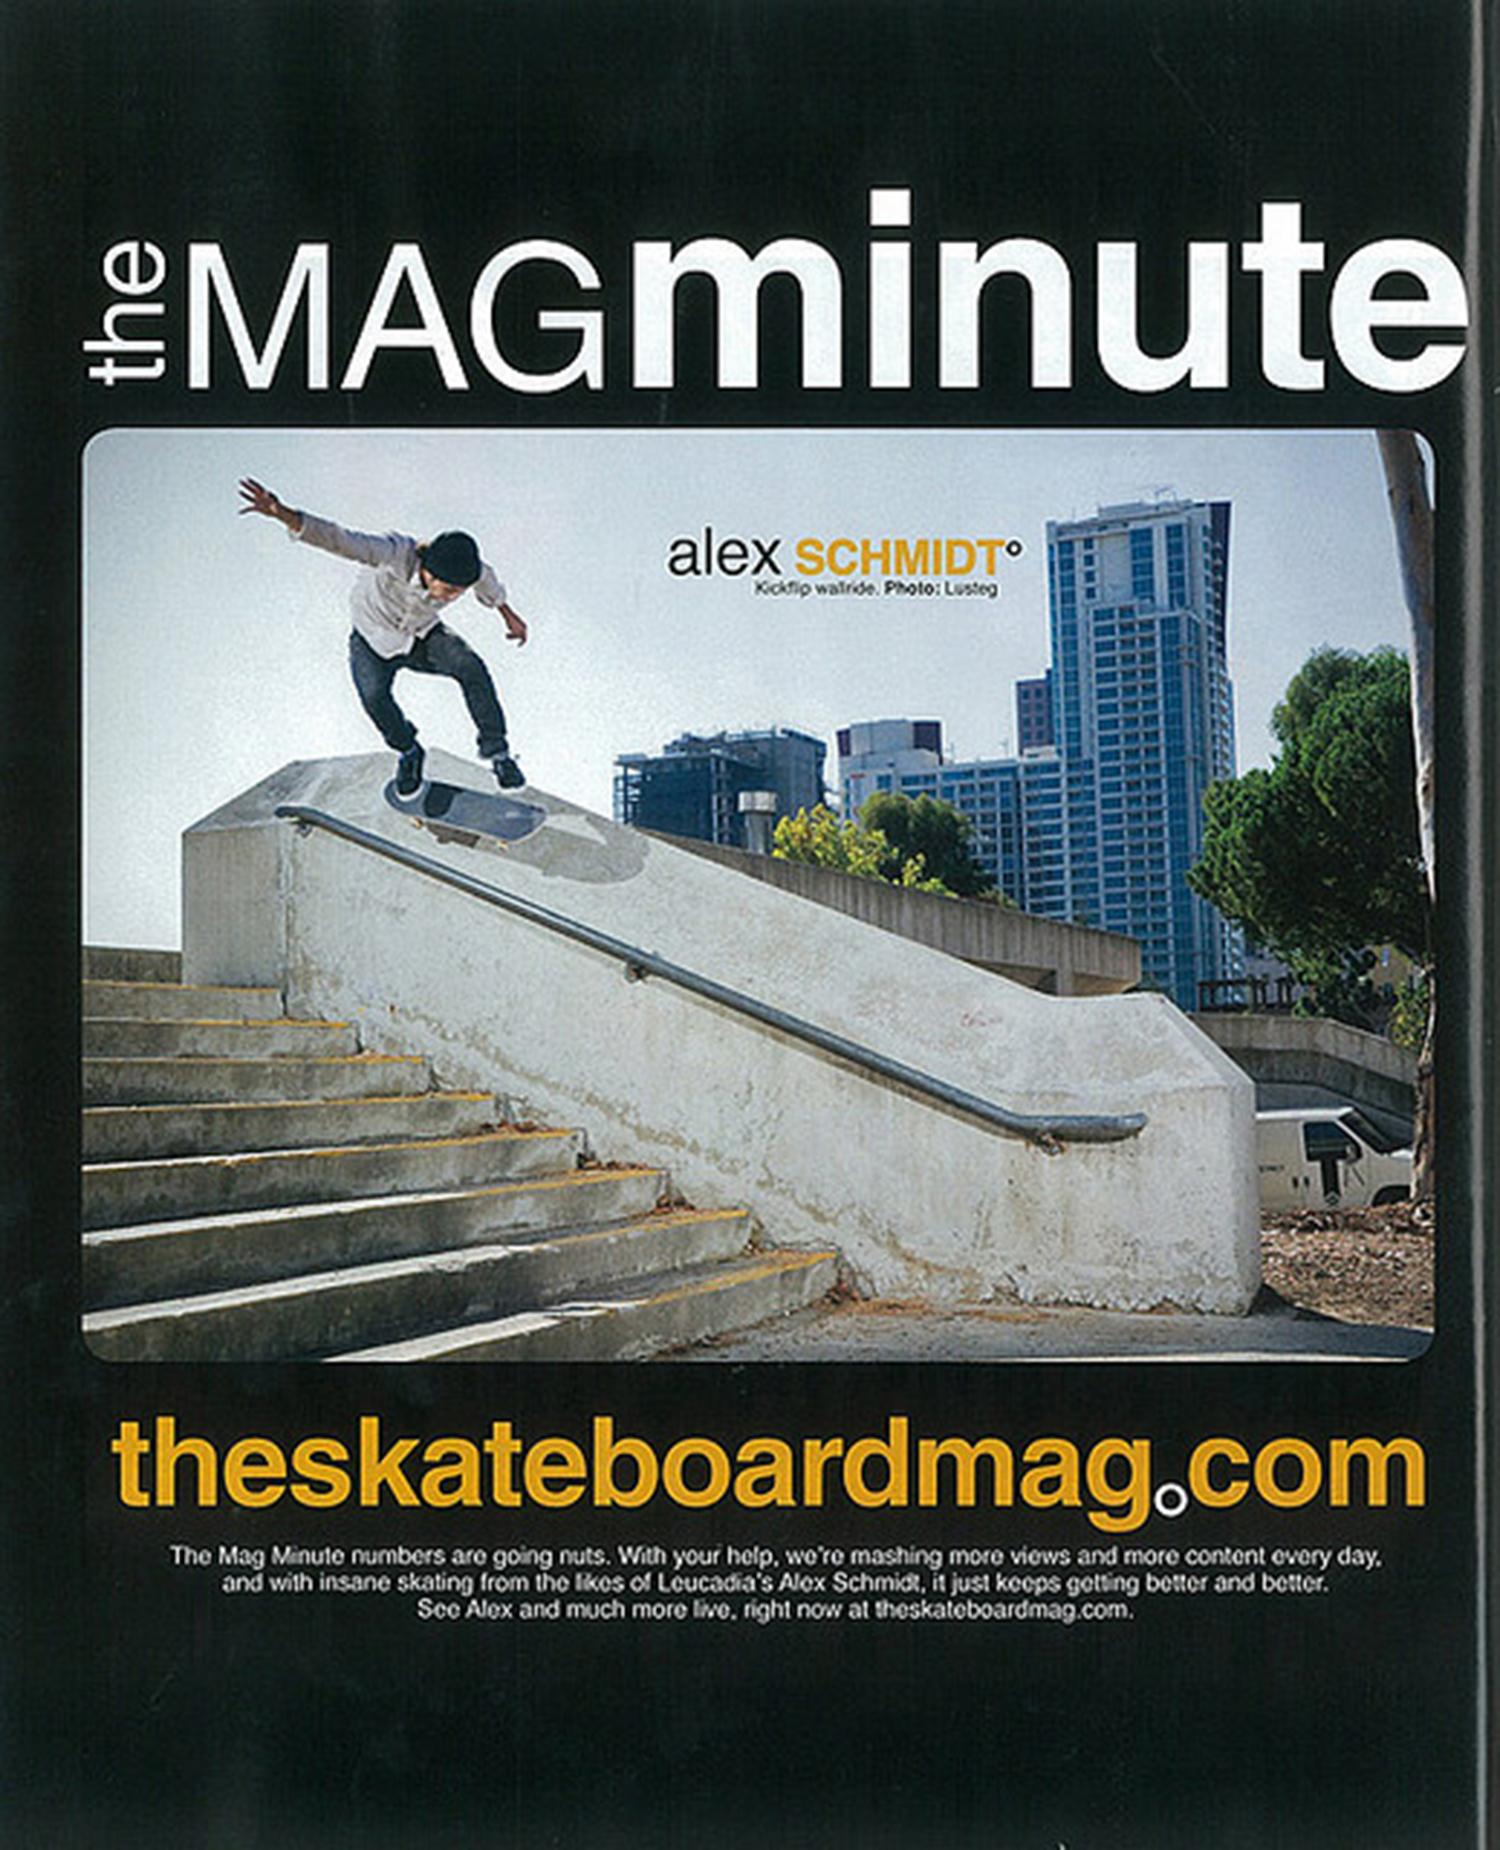 50_alex_schmidt_the_mag_minute_tsm.jpg